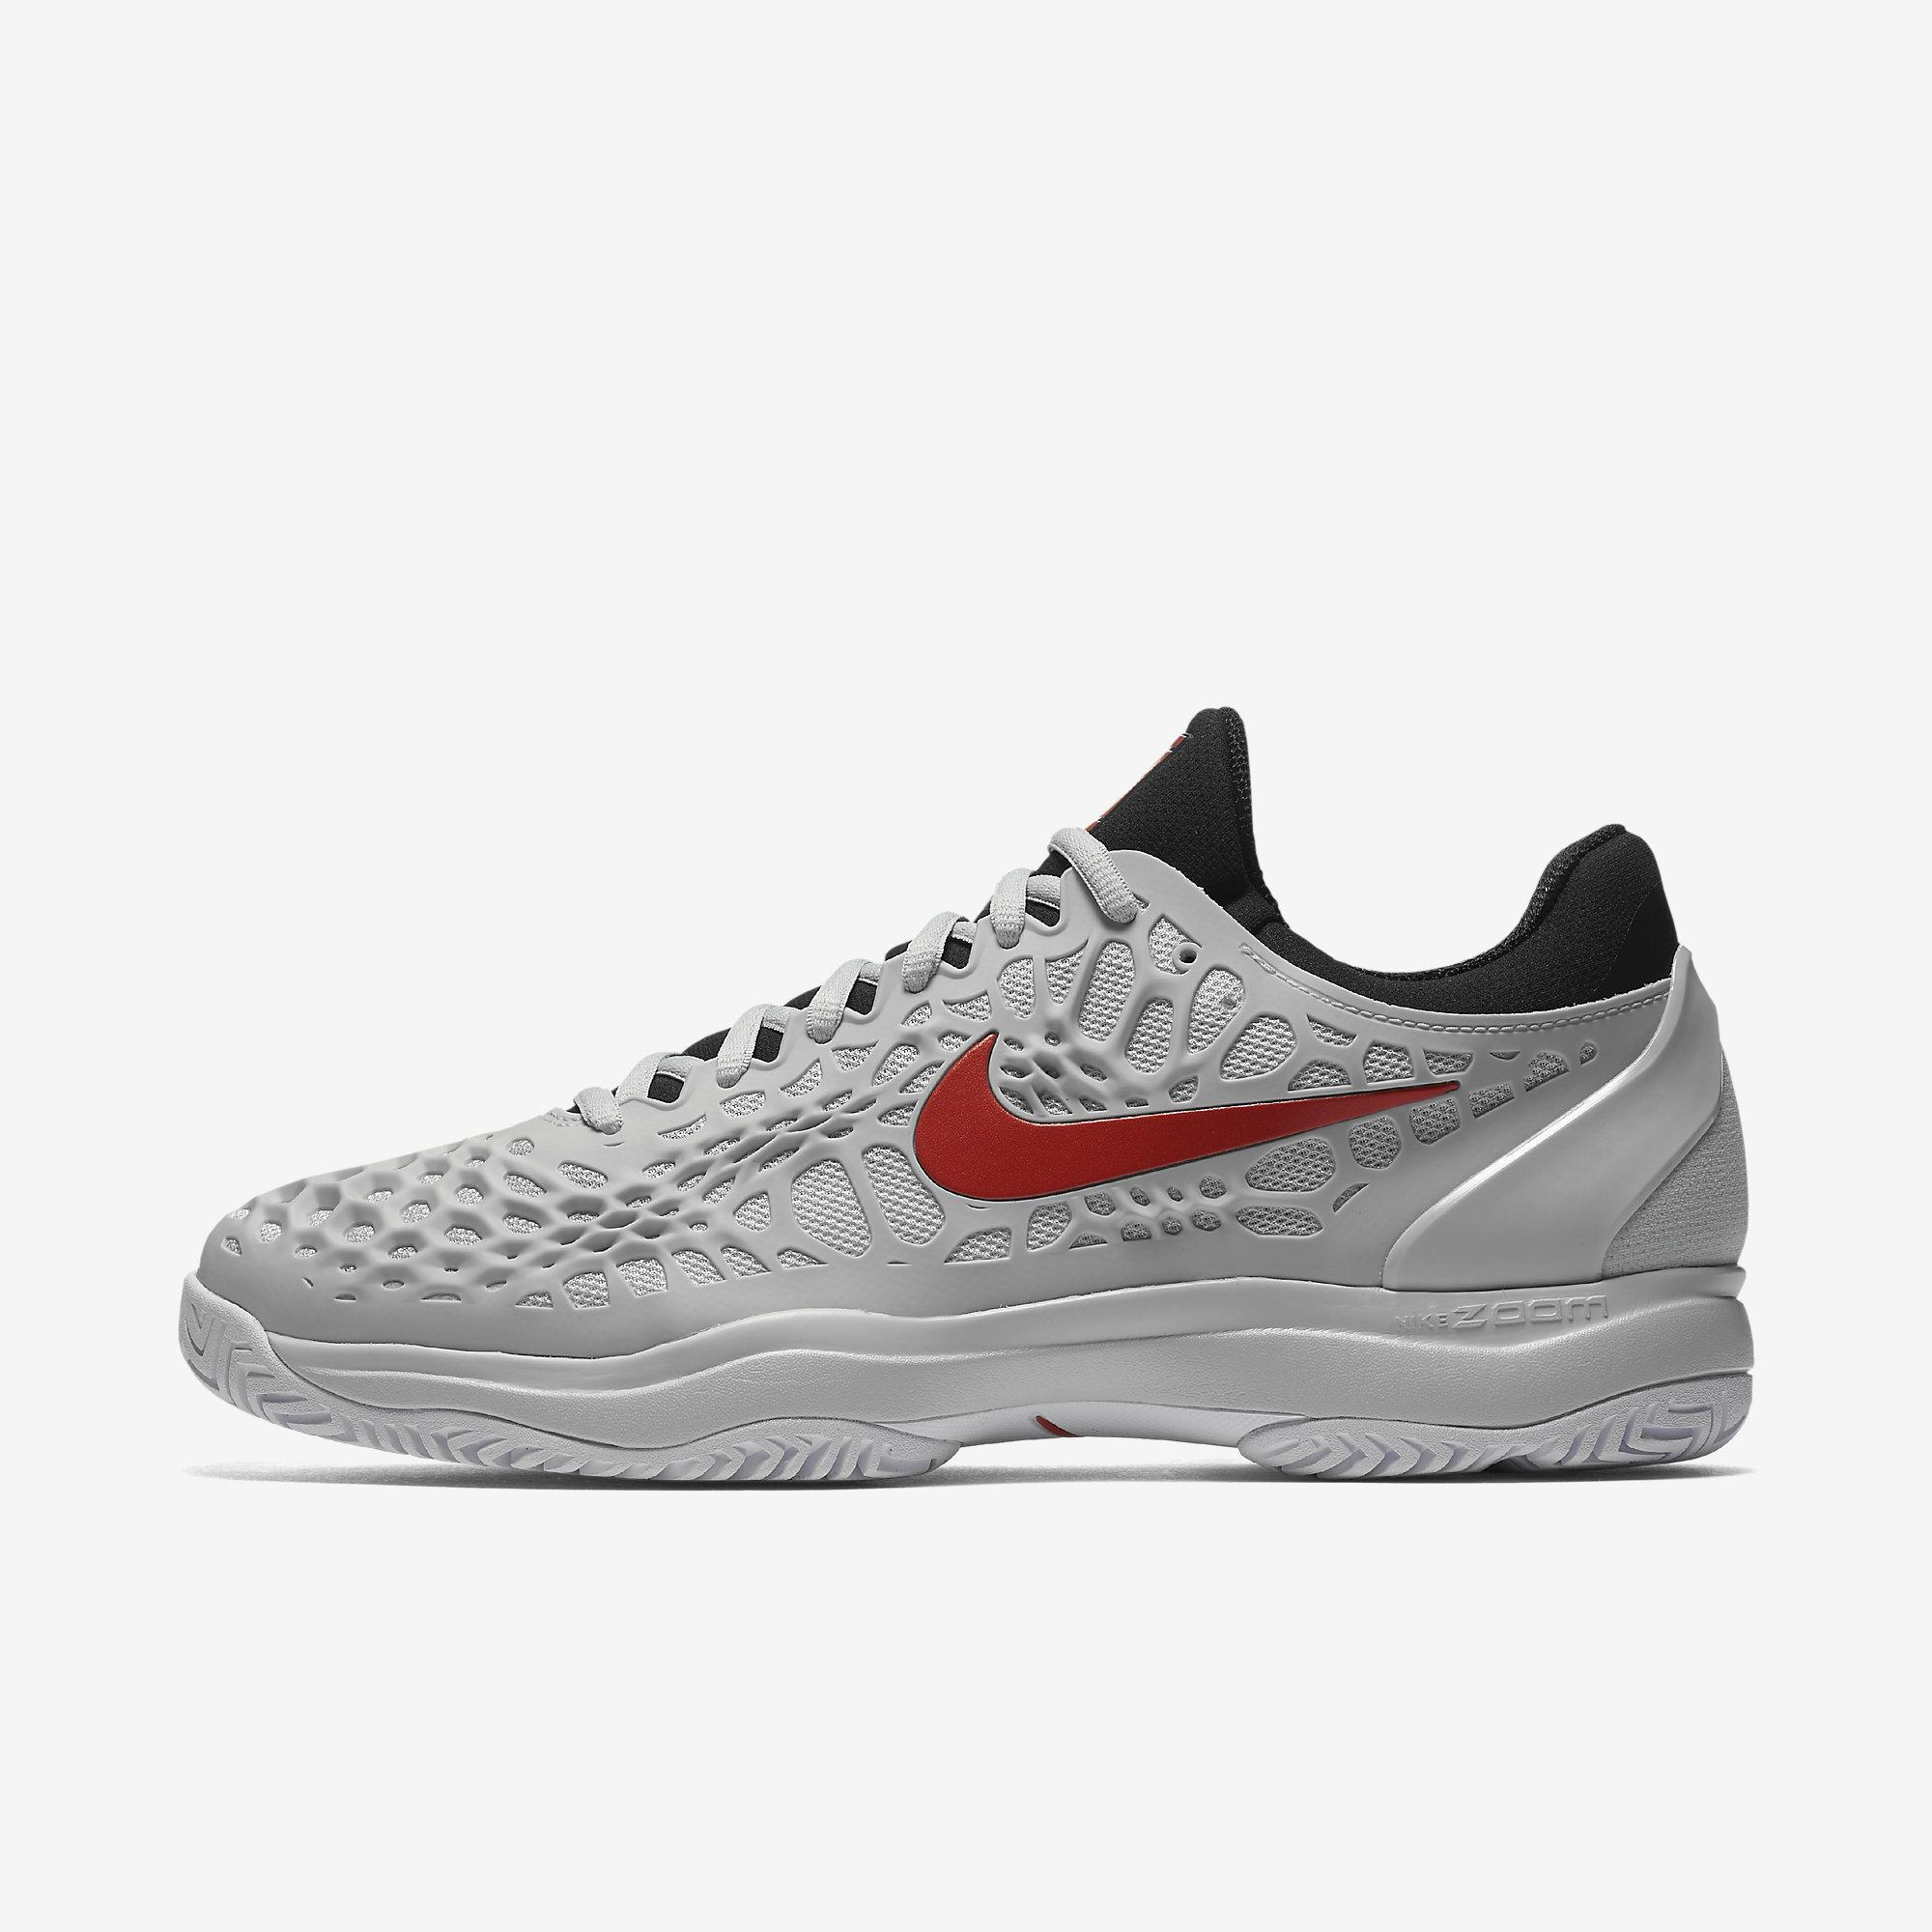 7efaed8e8afa Nike Mens Zoom Cage 3 Tennis Shoes - Pure Platinum Black - Tennisnuts.com